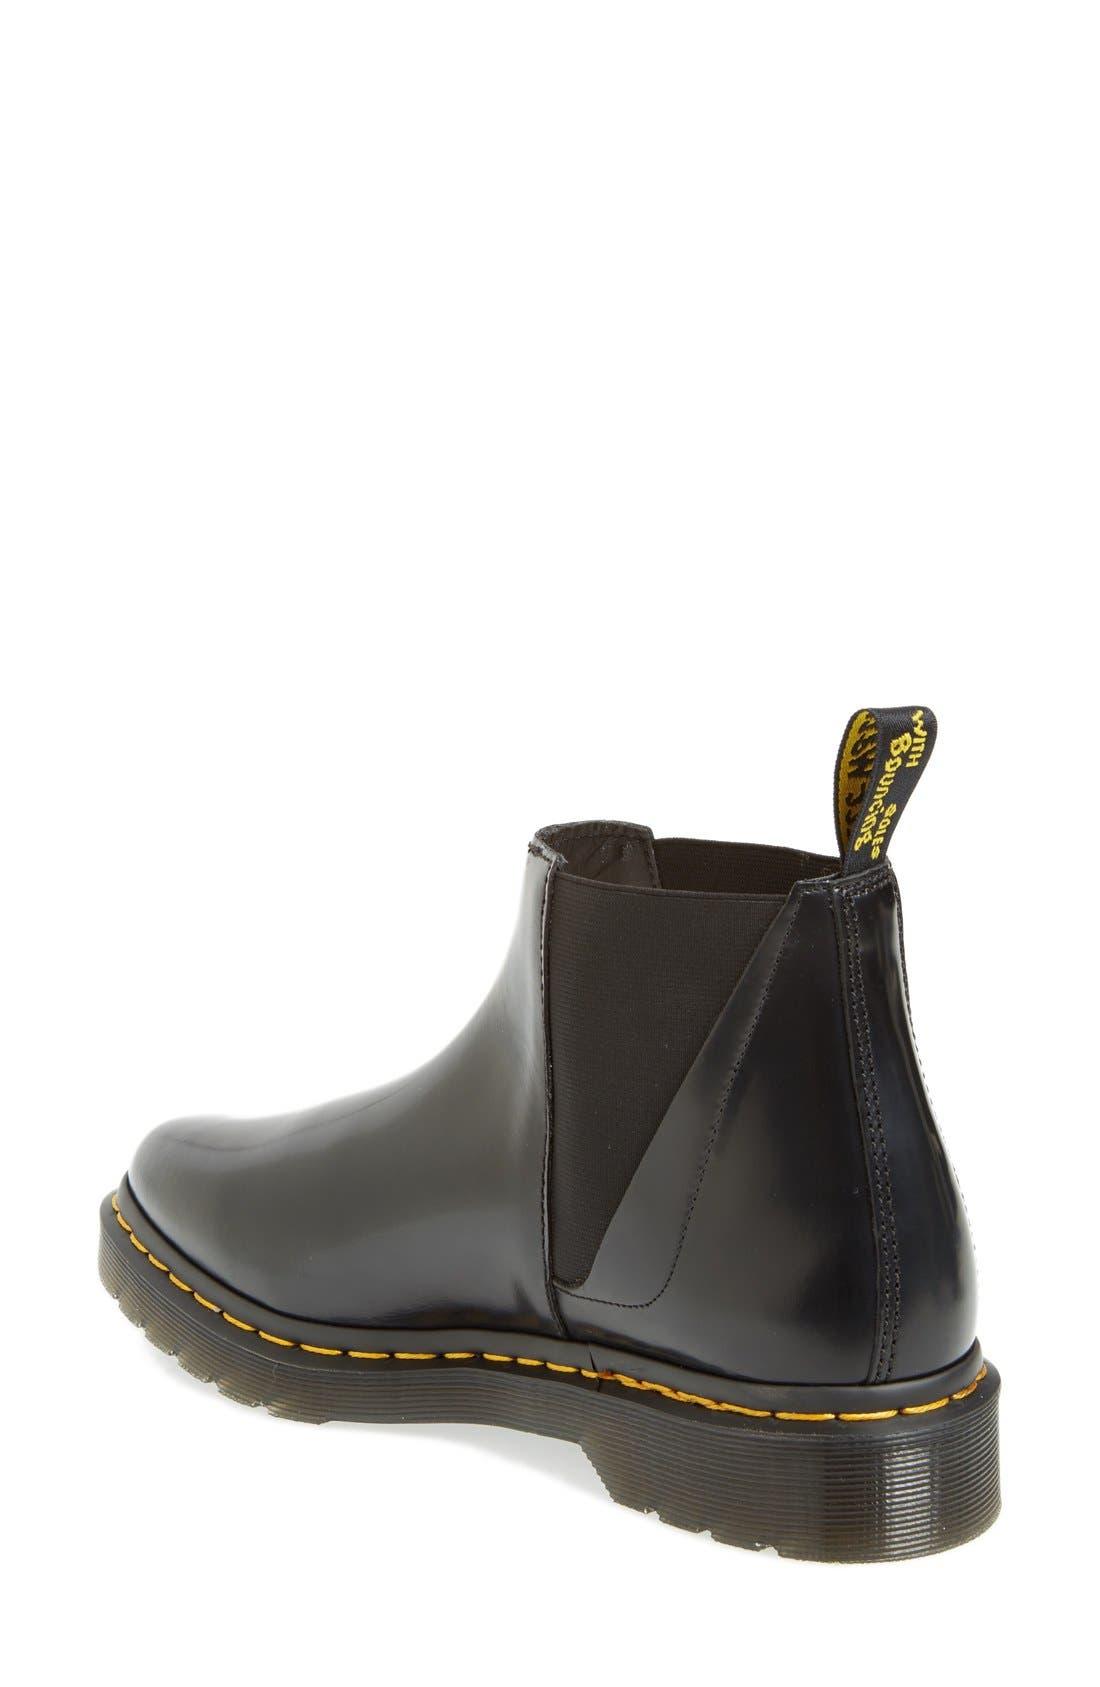 'Bianca' Chelsea Boot,                             Alternate thumbnail 2, color,                             001